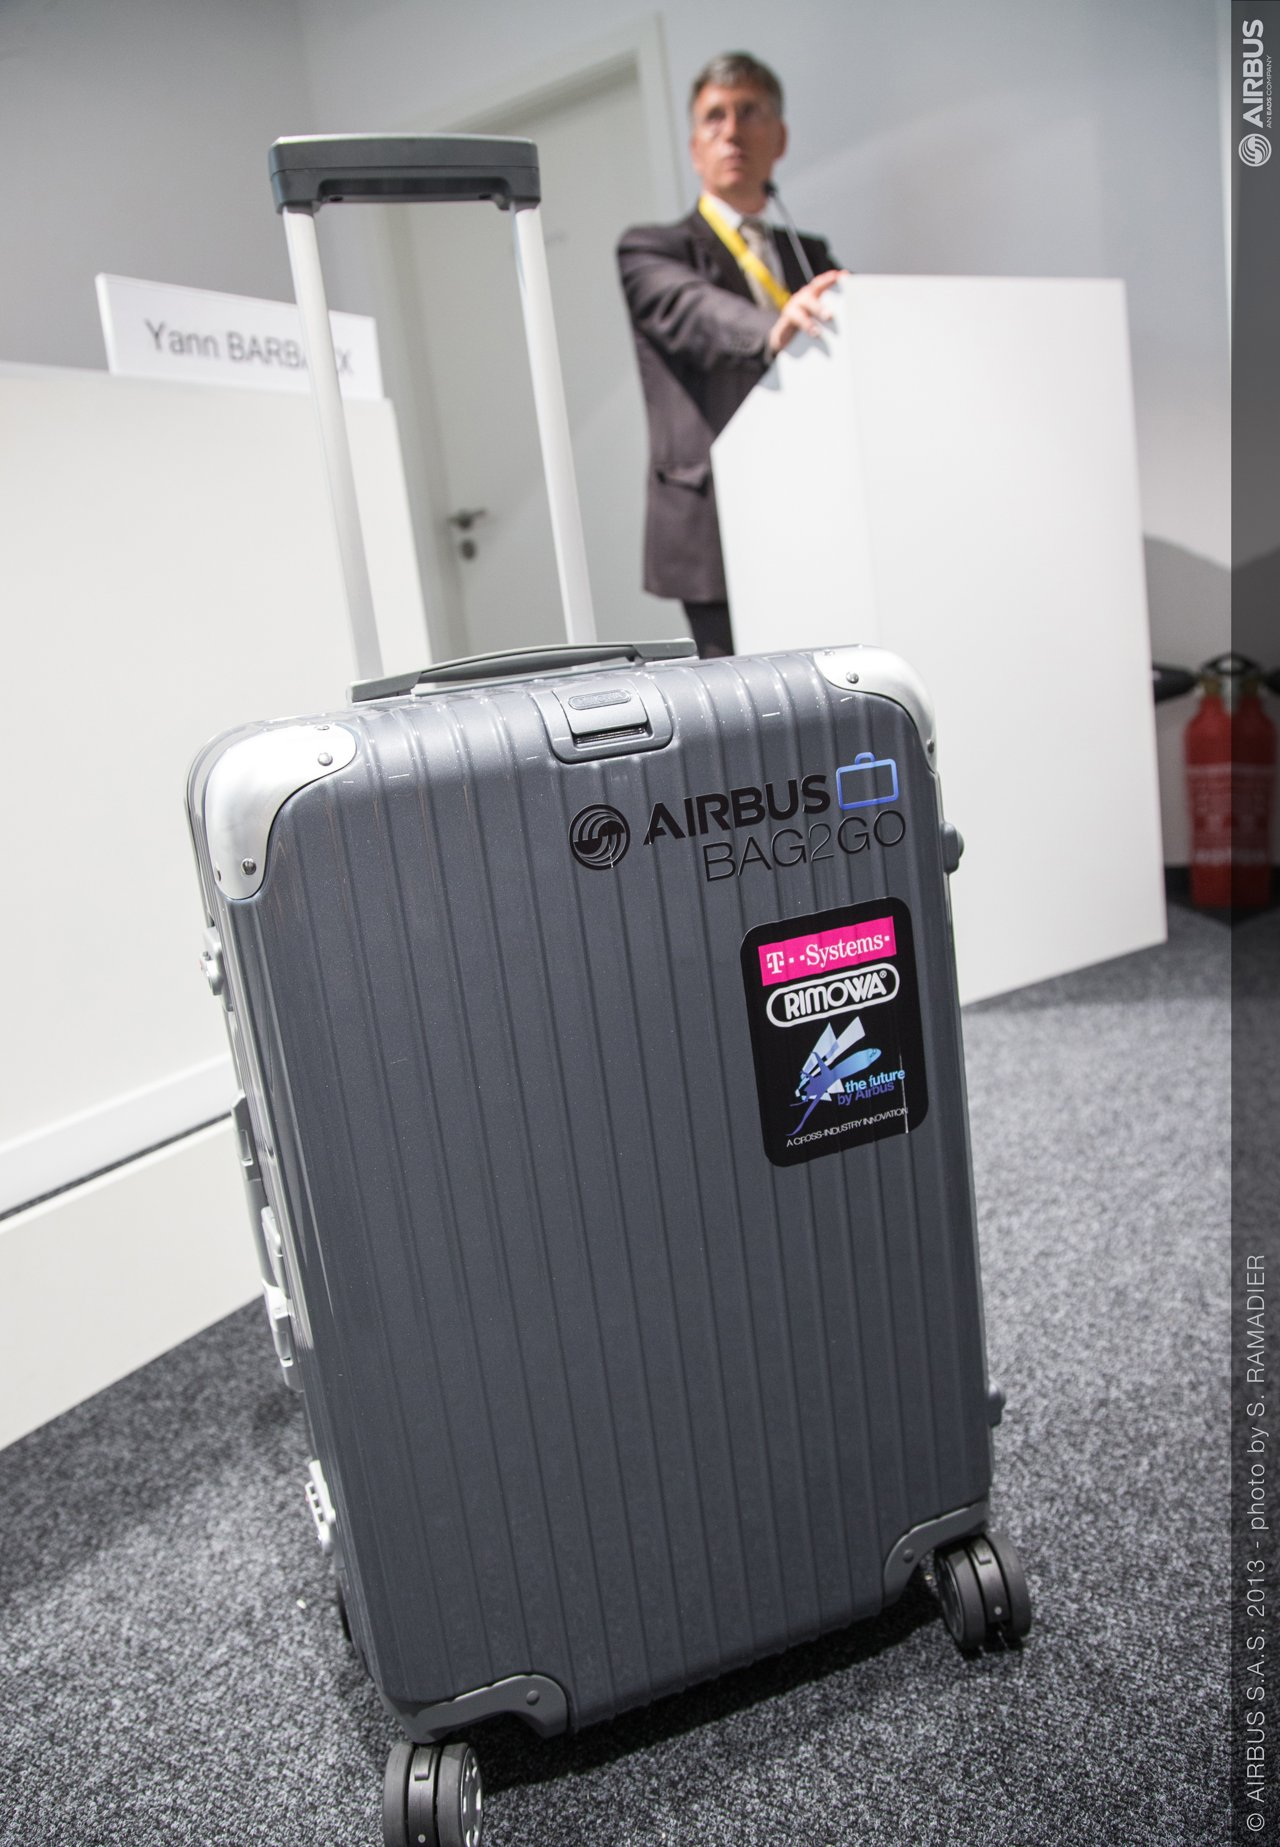 Airbus - Bag2go -Yann Barbaux